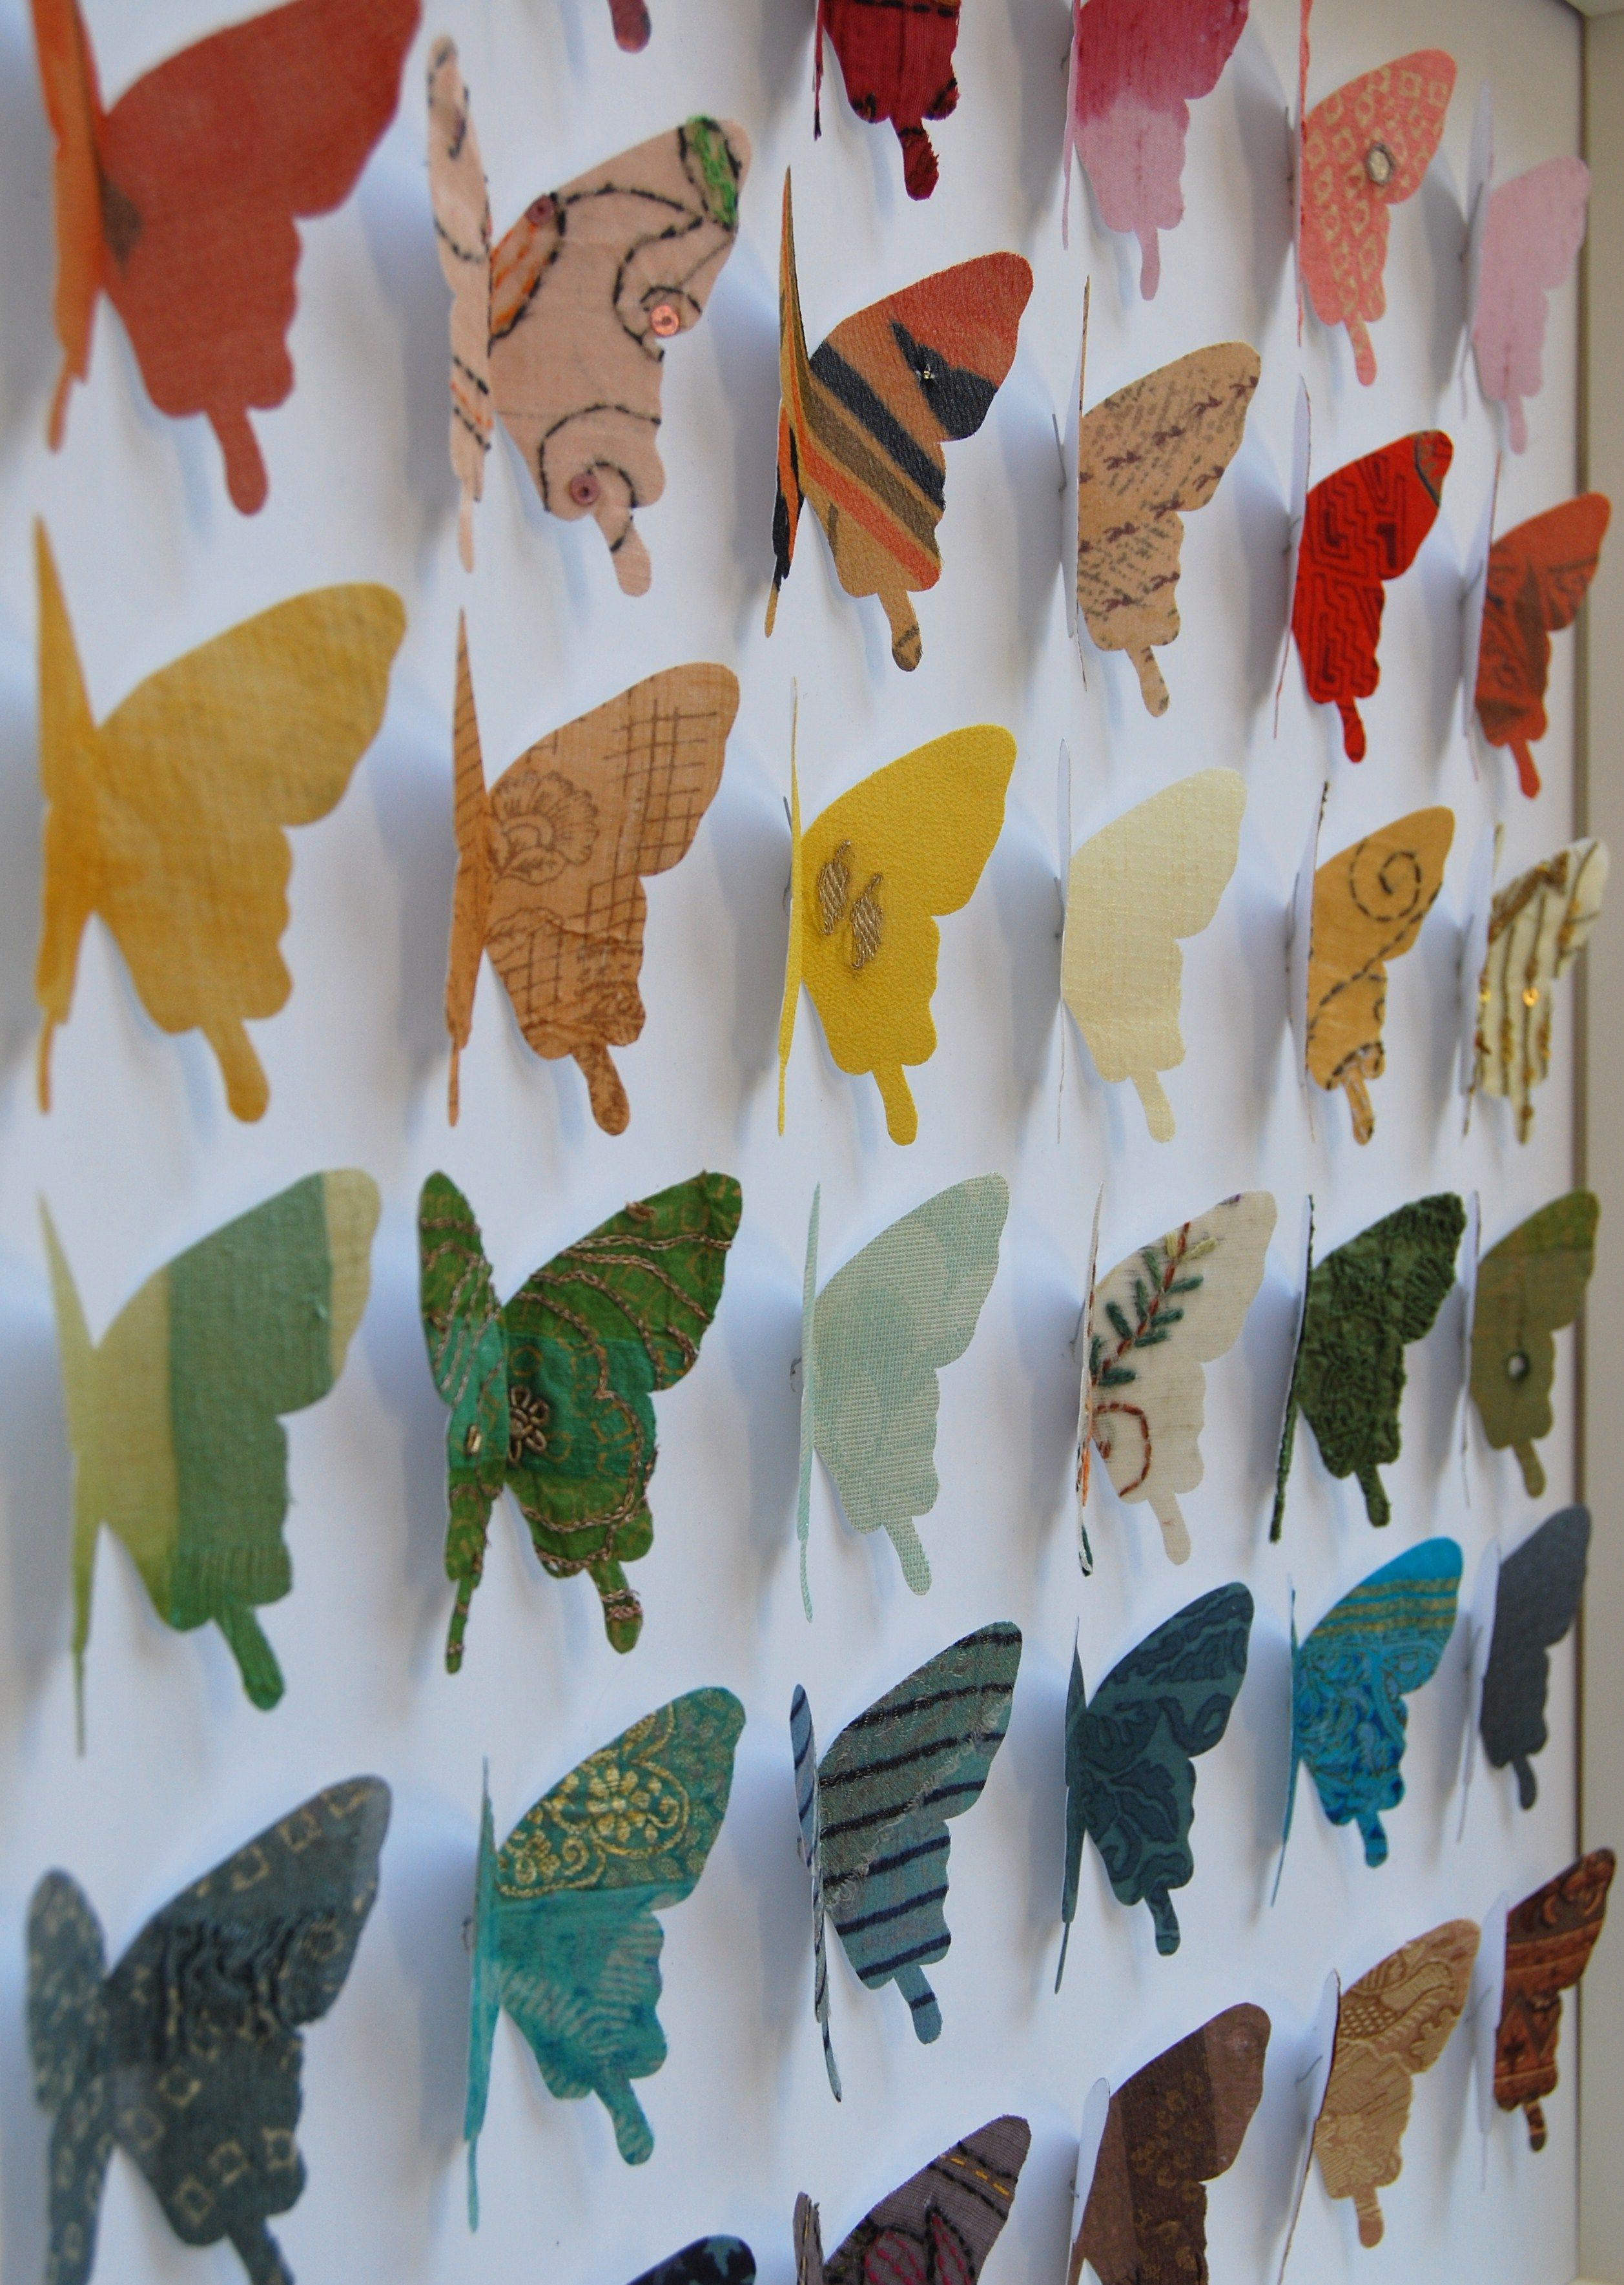 Paper Butterflies On Canvas, For Those Of Us Who Think Real Butterflies On  Canvas Is Creepy As Room Design Design Ideas Interior Design 2012 Interior  Design ...